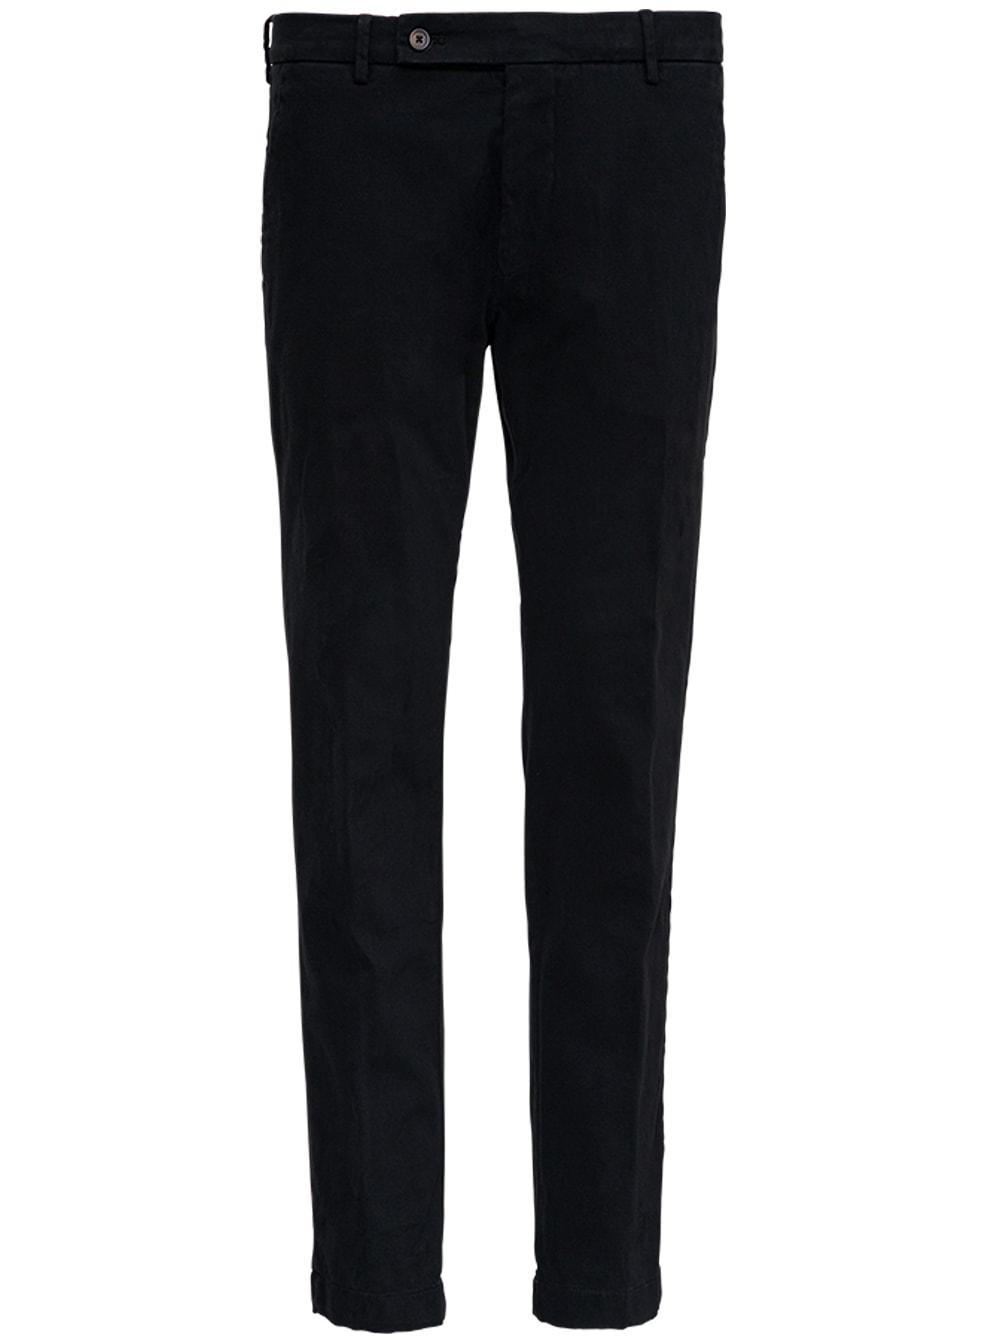 Black Cotton Tailored Pants